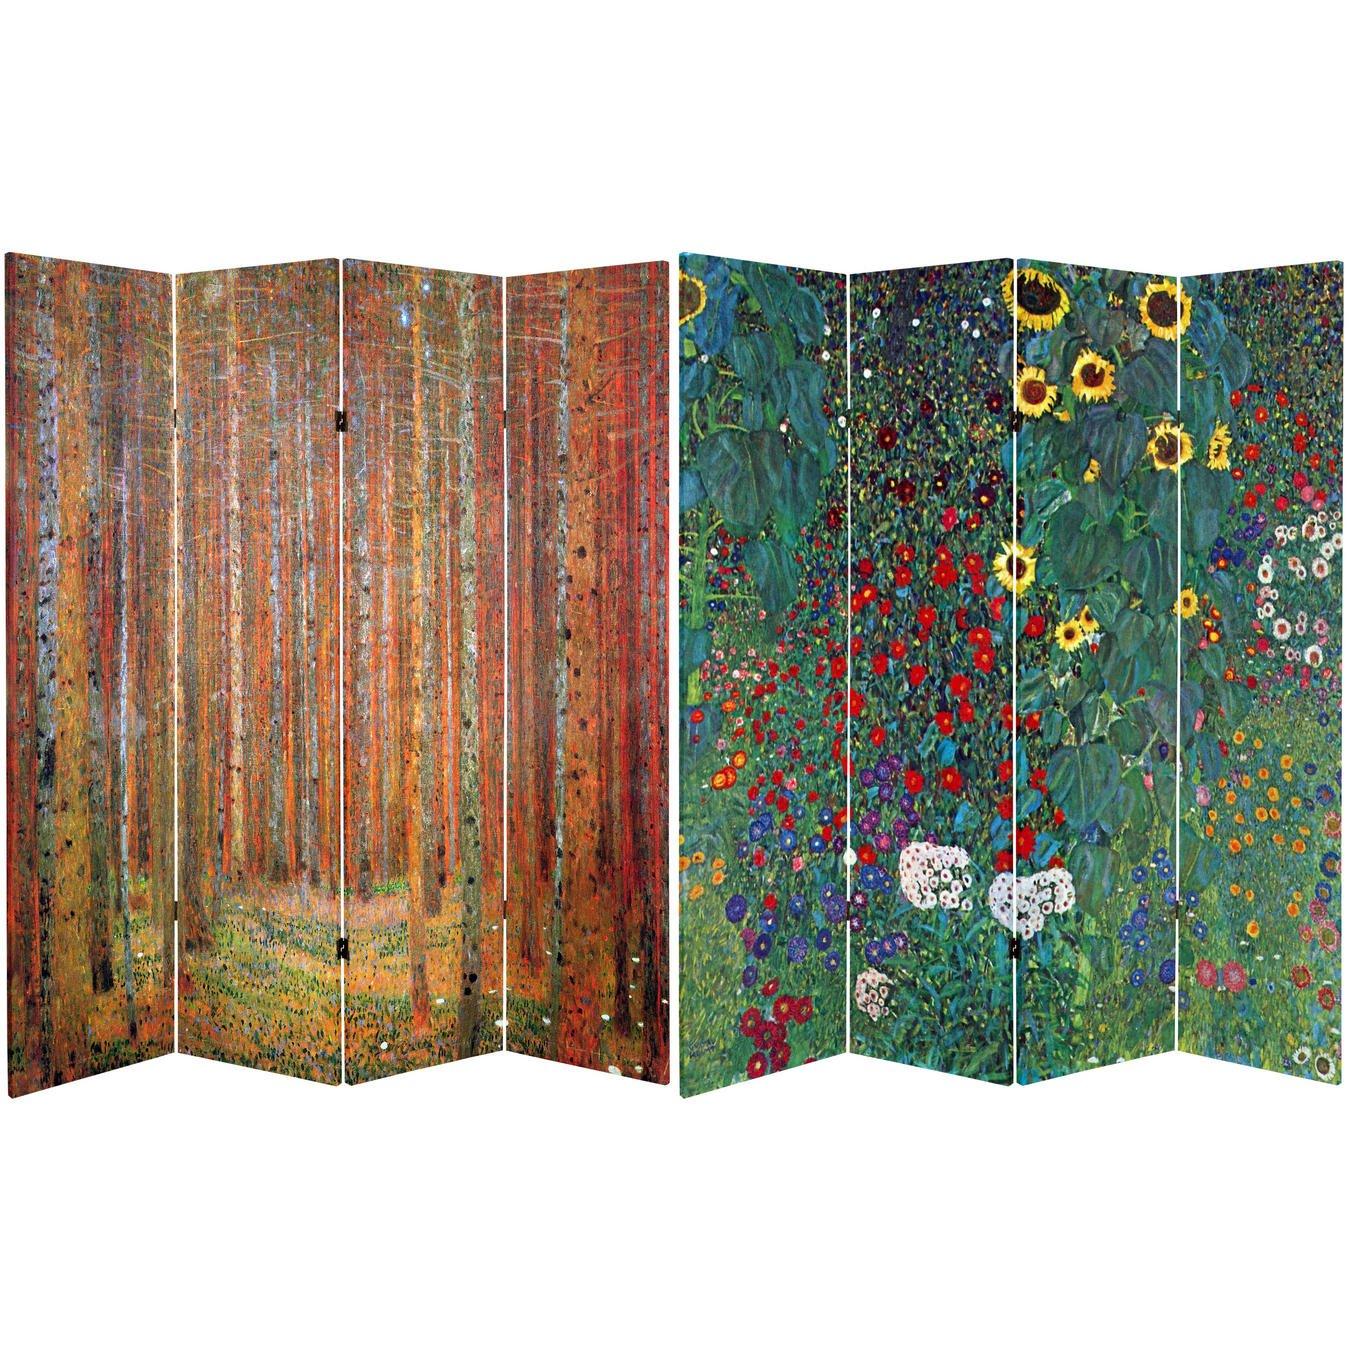 Oriental Furniture 6 ft. Tall Double Sided Works of Klimt Room Divider - Tannenwald/Farm Garden